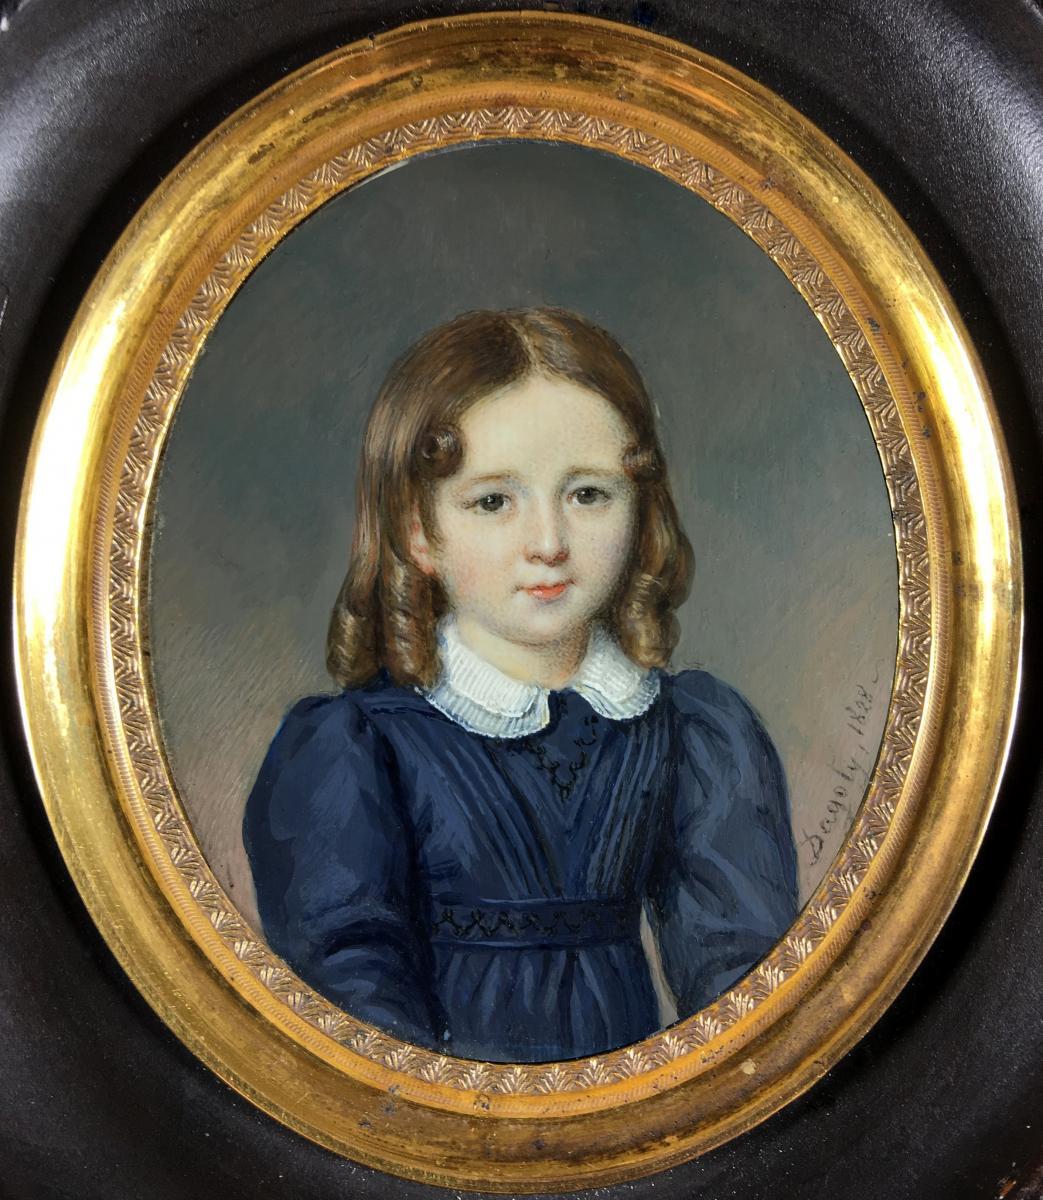 Pierre-Edouard Gautier Dagoty, portrait miniature ,1828